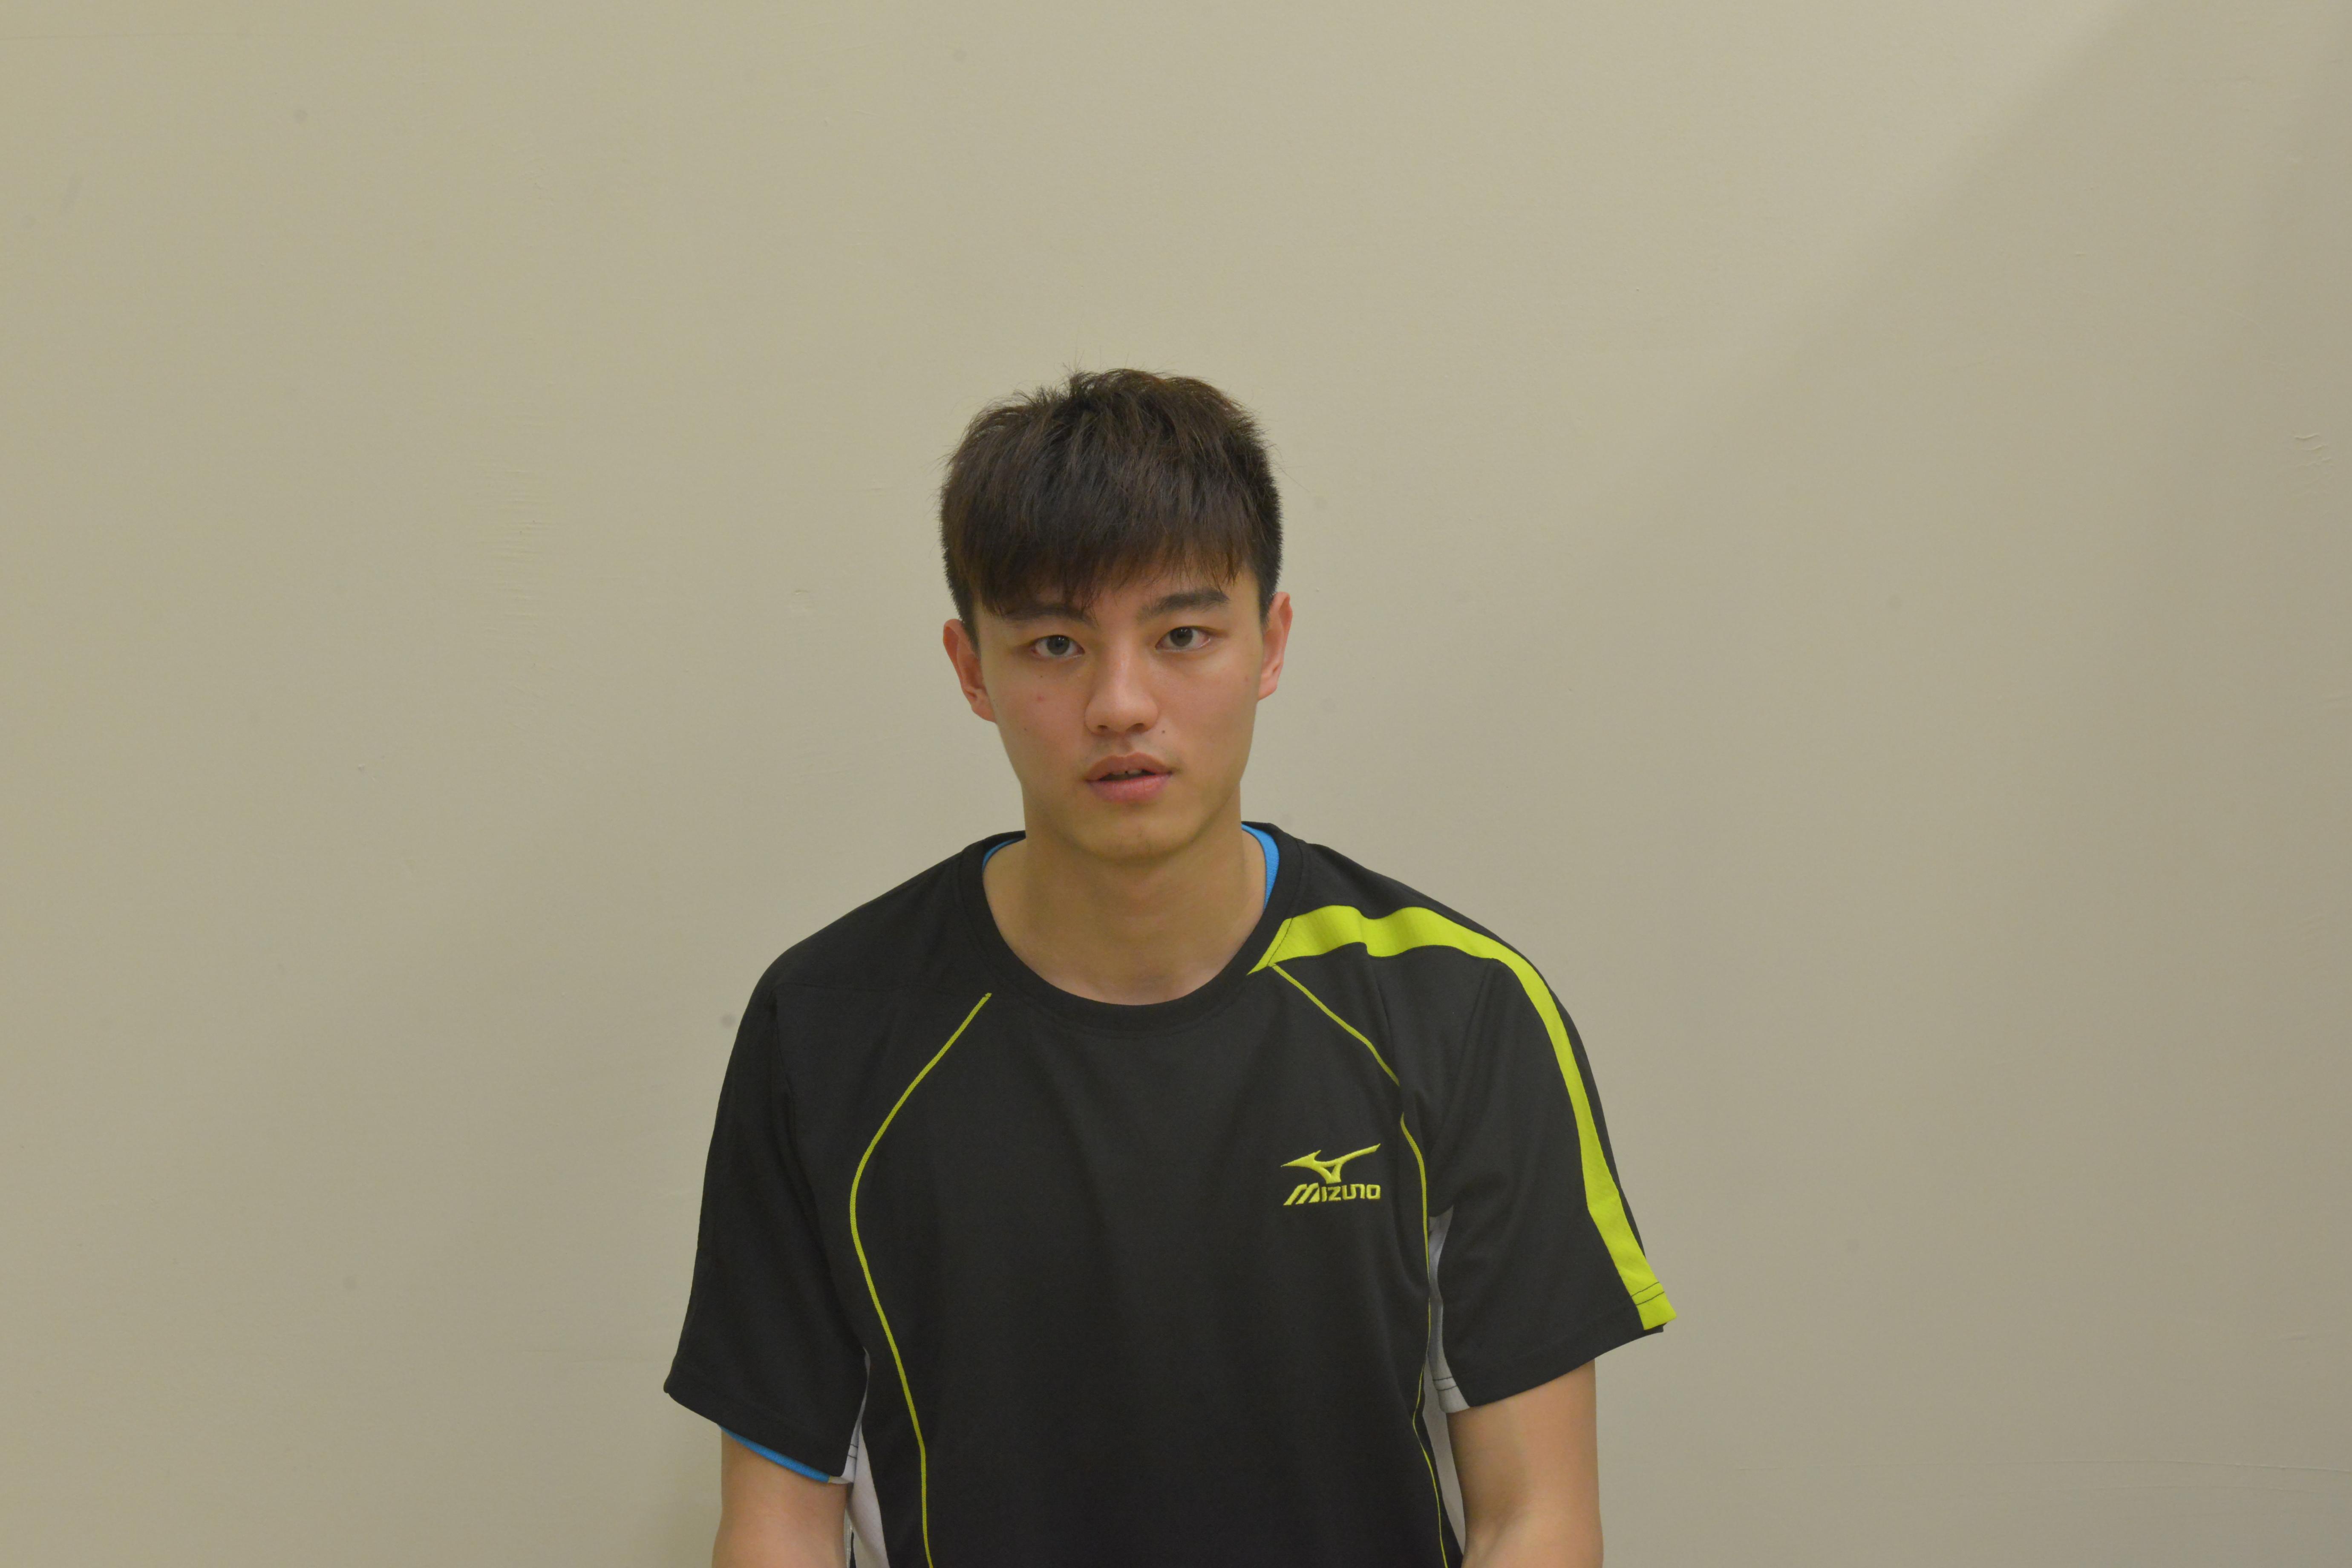 Tsung-Hsuan Wu